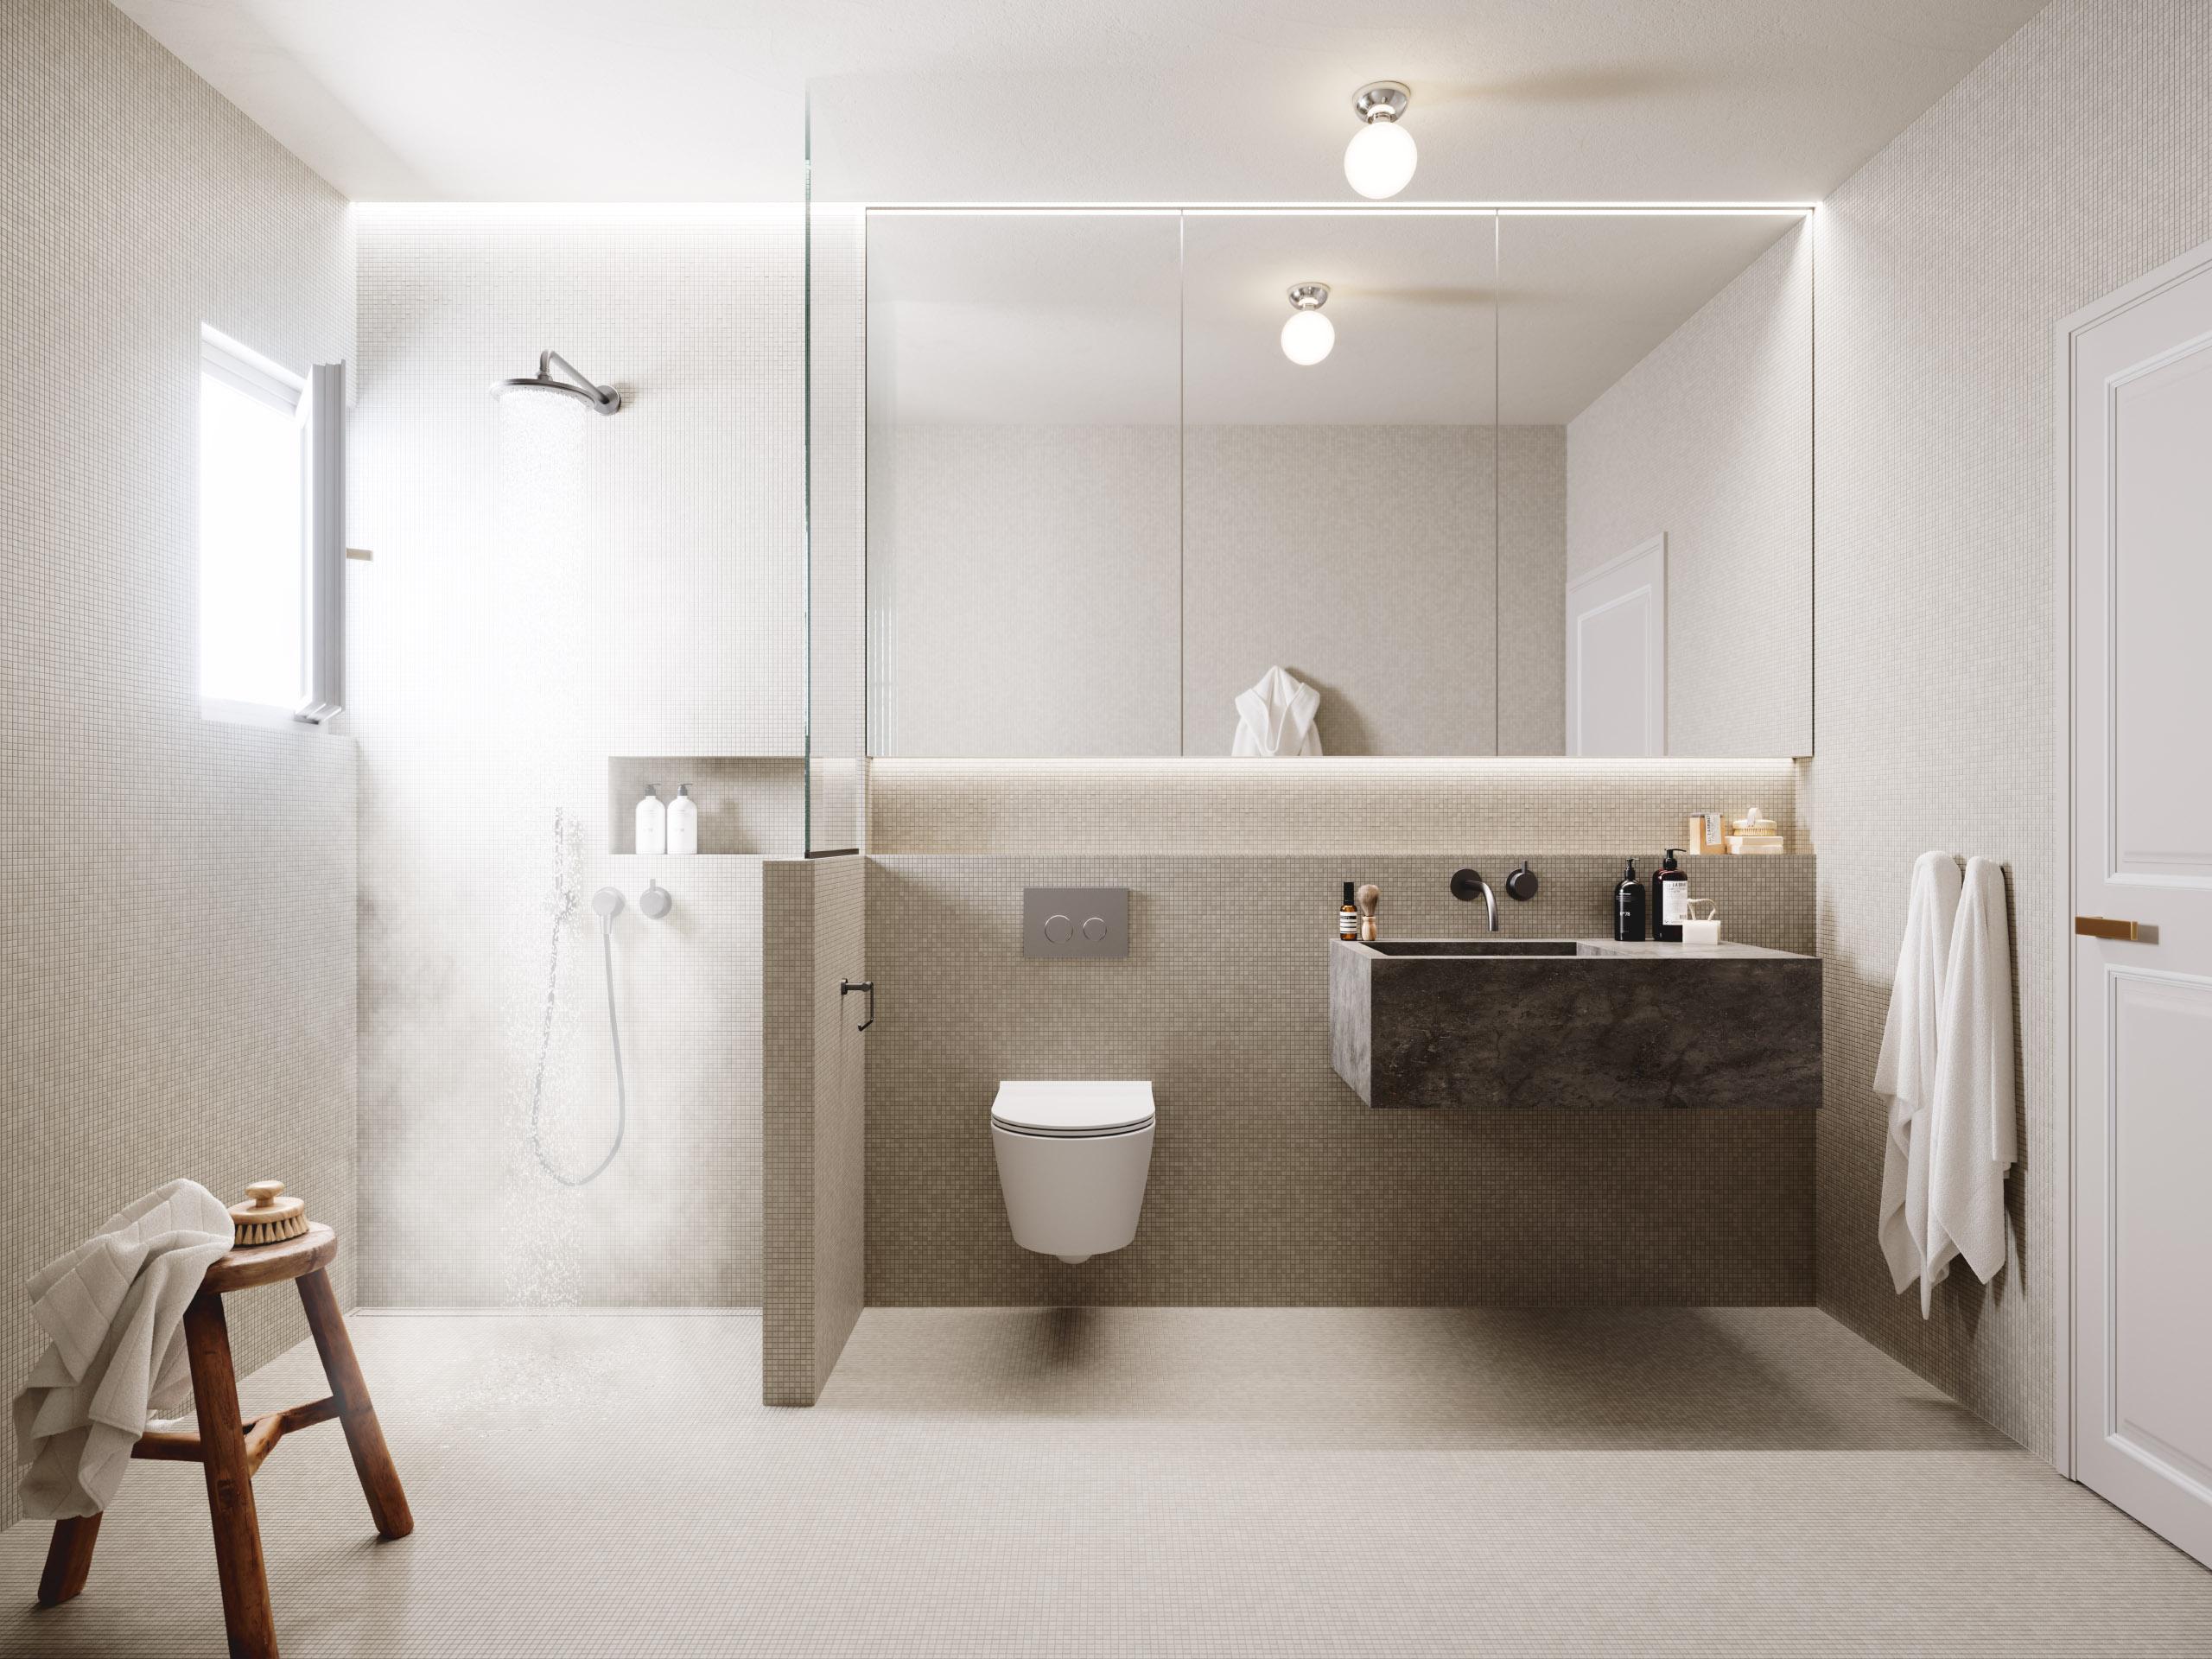 Bathroom_Small_2560px_Jpeg9